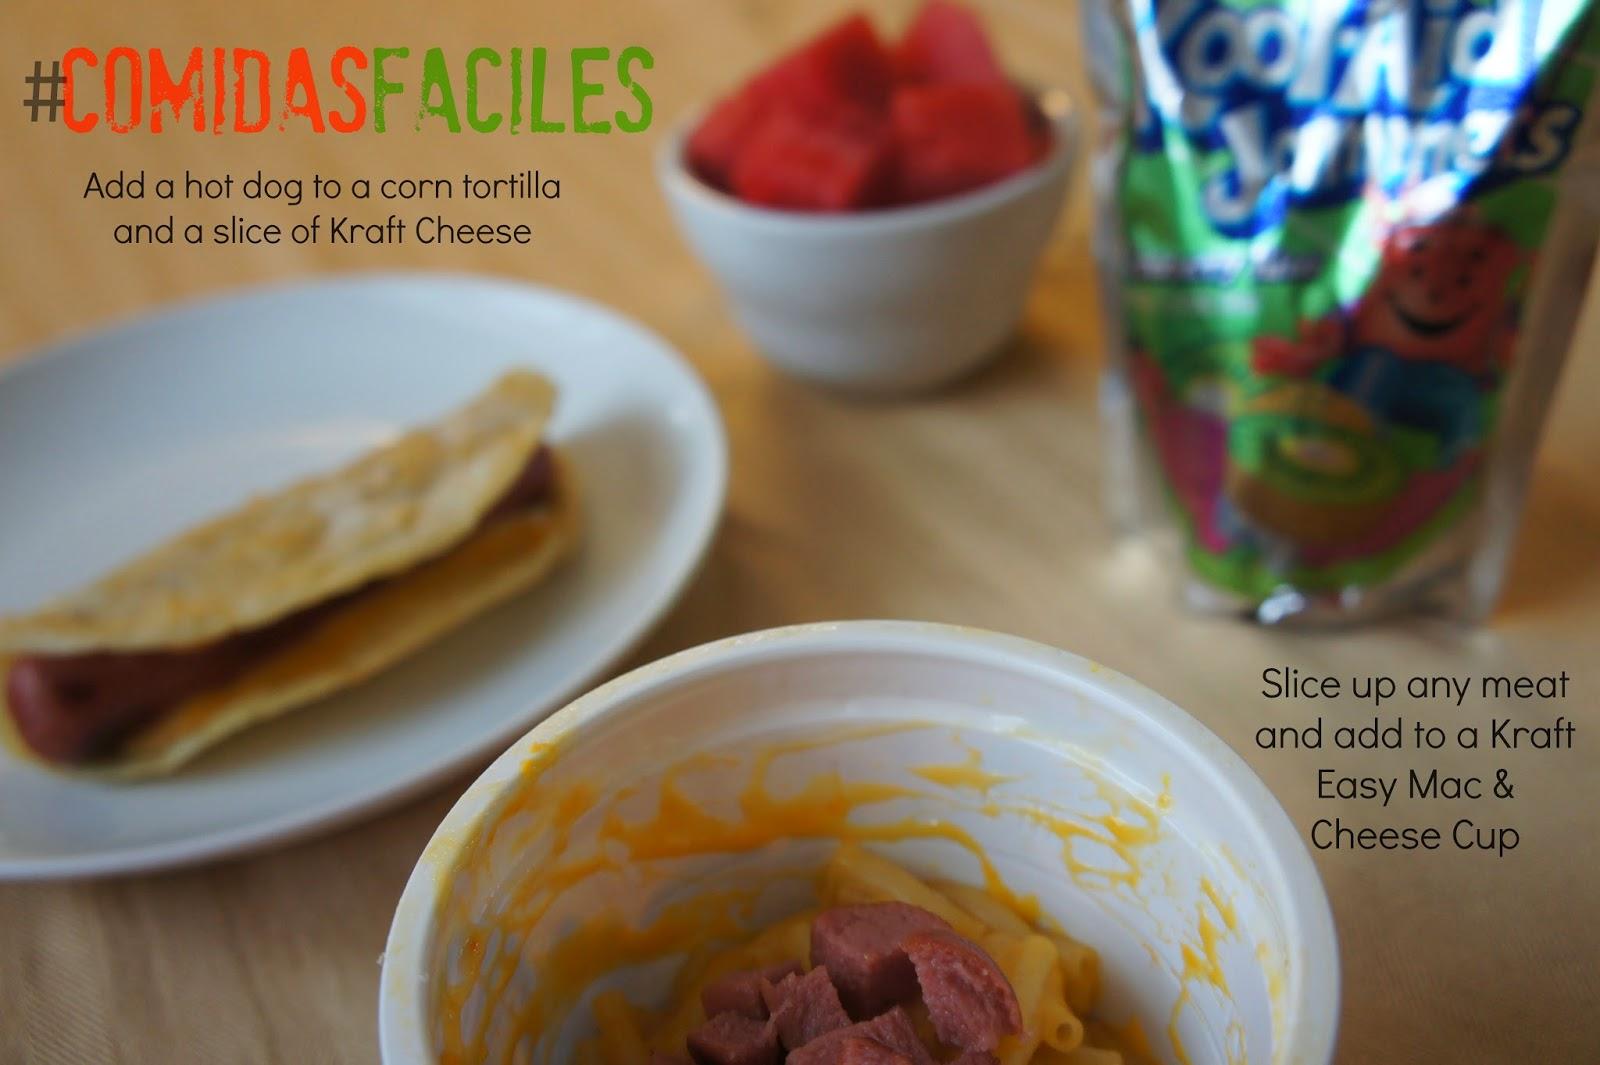 comidas-faciles-kraft-cheese-macaroni-kool-aid